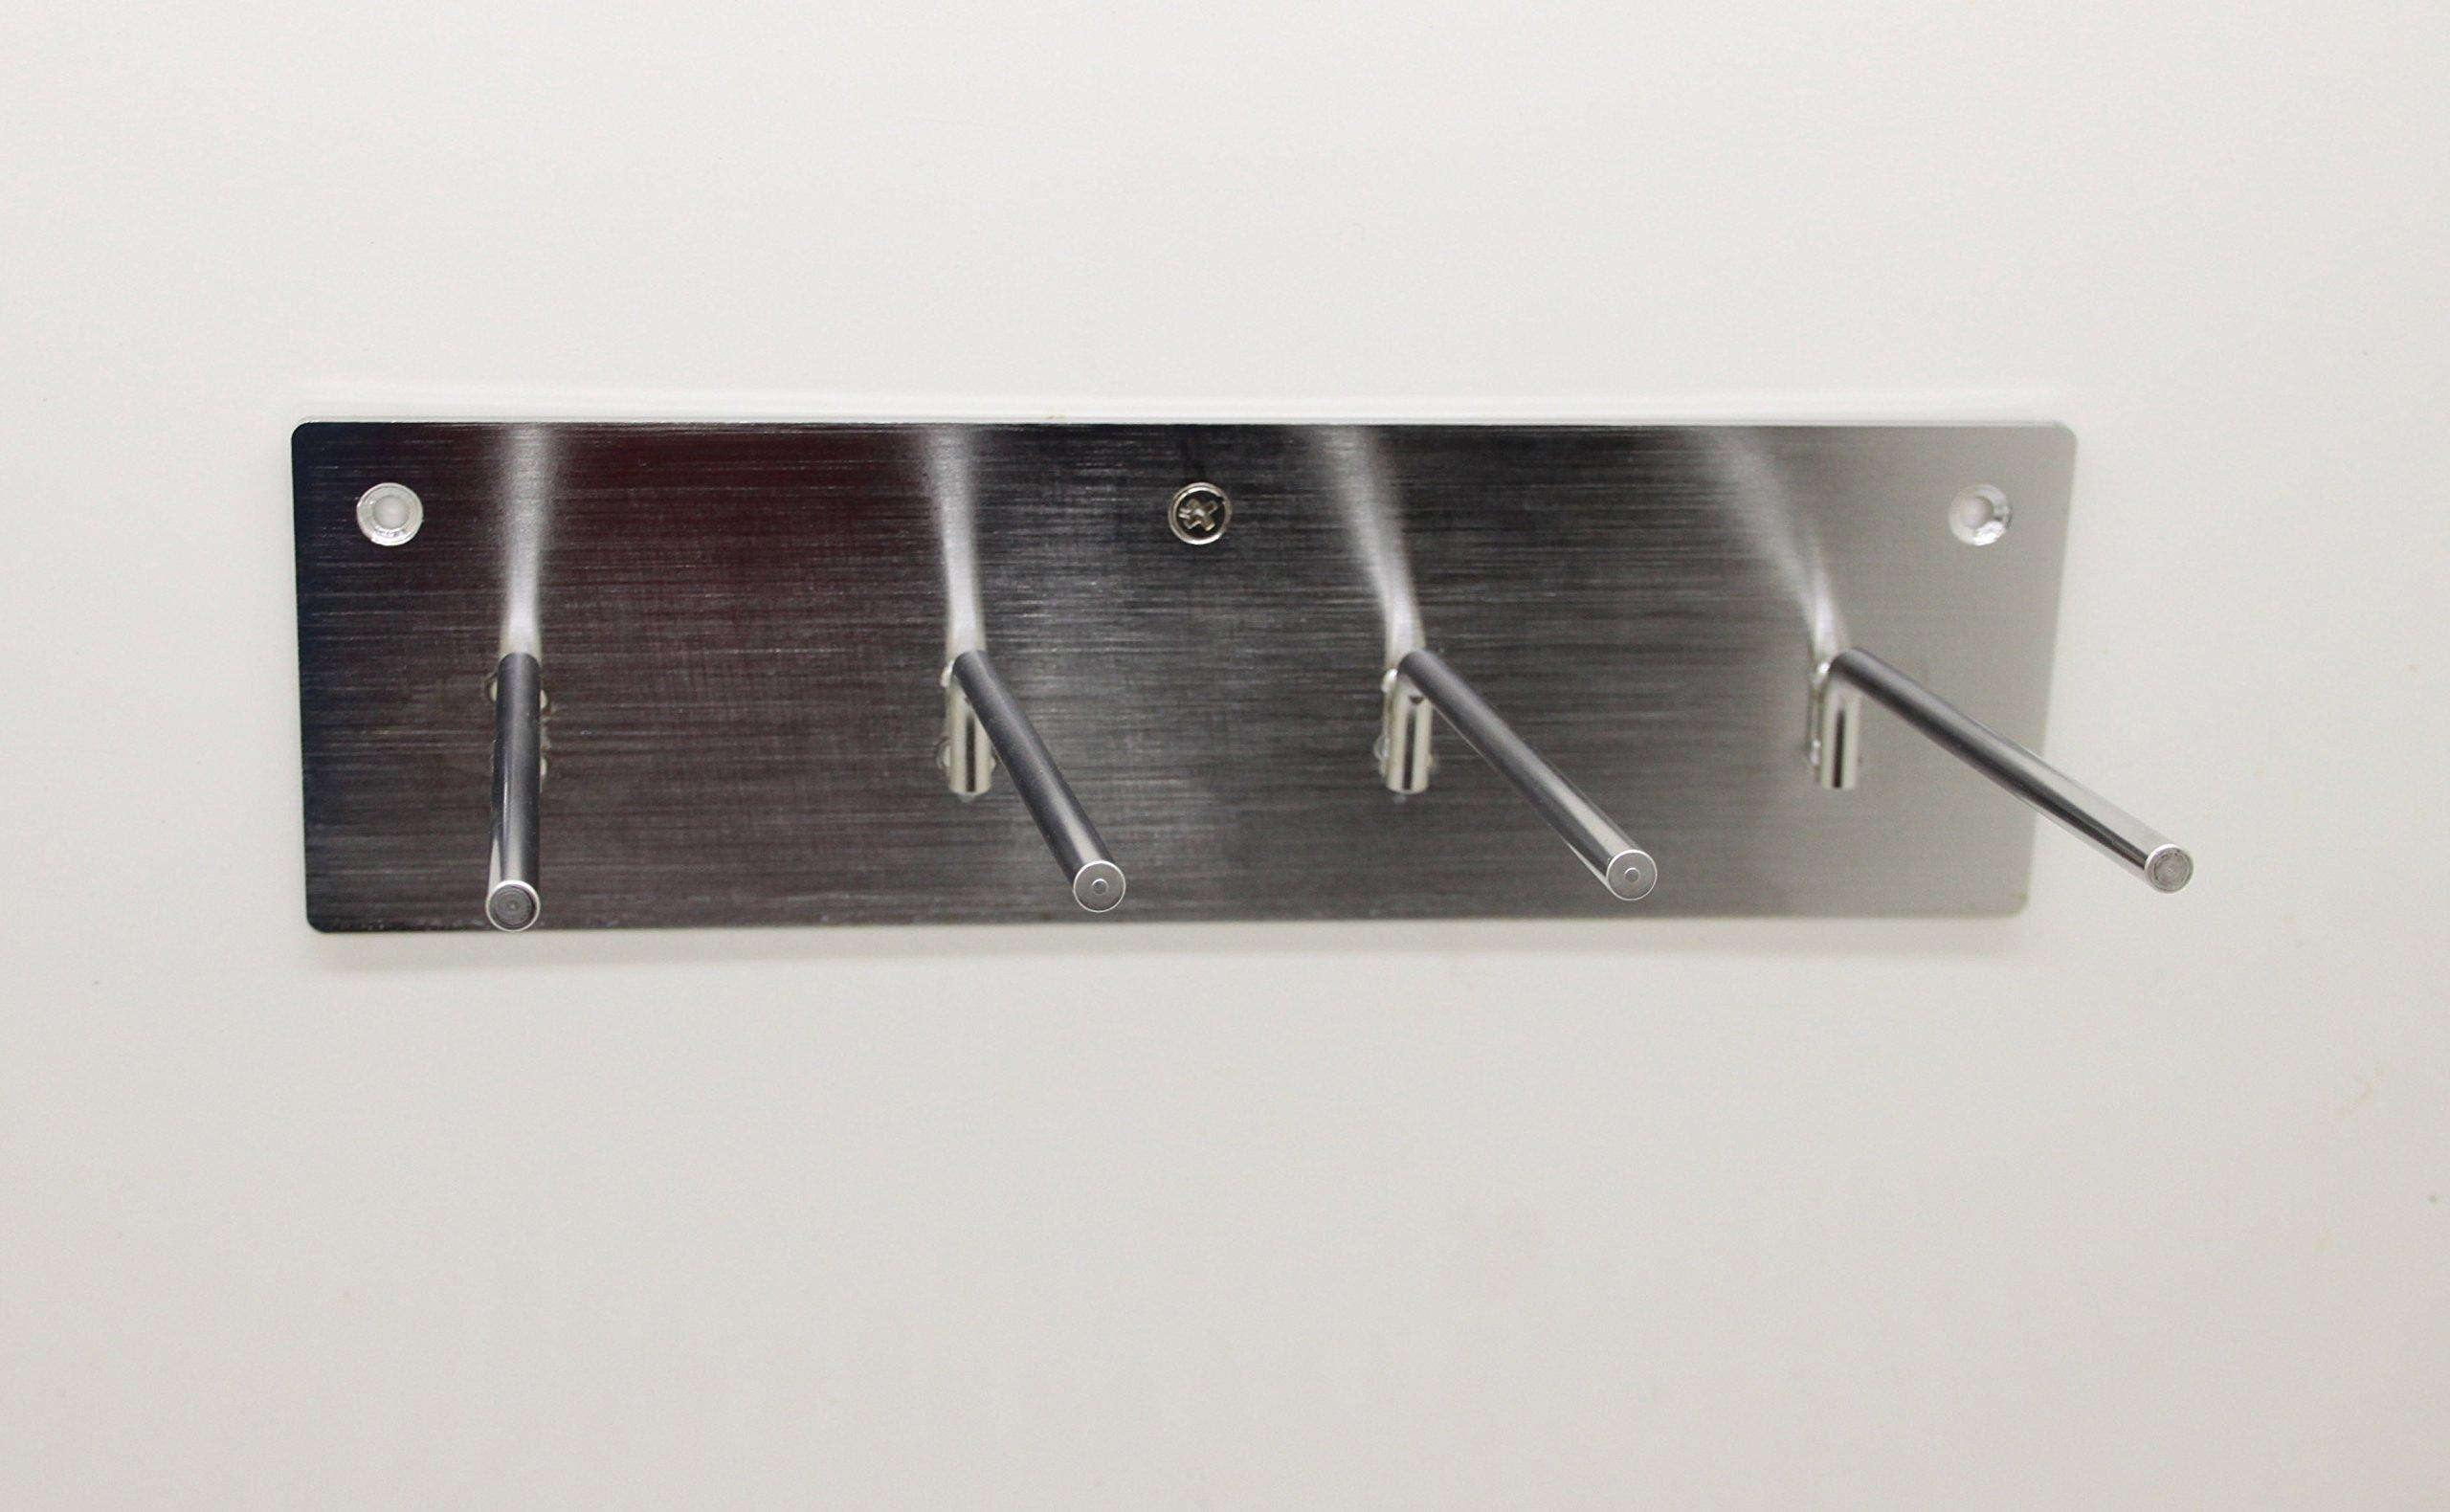 FixtureDisplays Set of 2 Pcs 4-PEG Lead Apron Wall-Mount Hook Hanger 15686